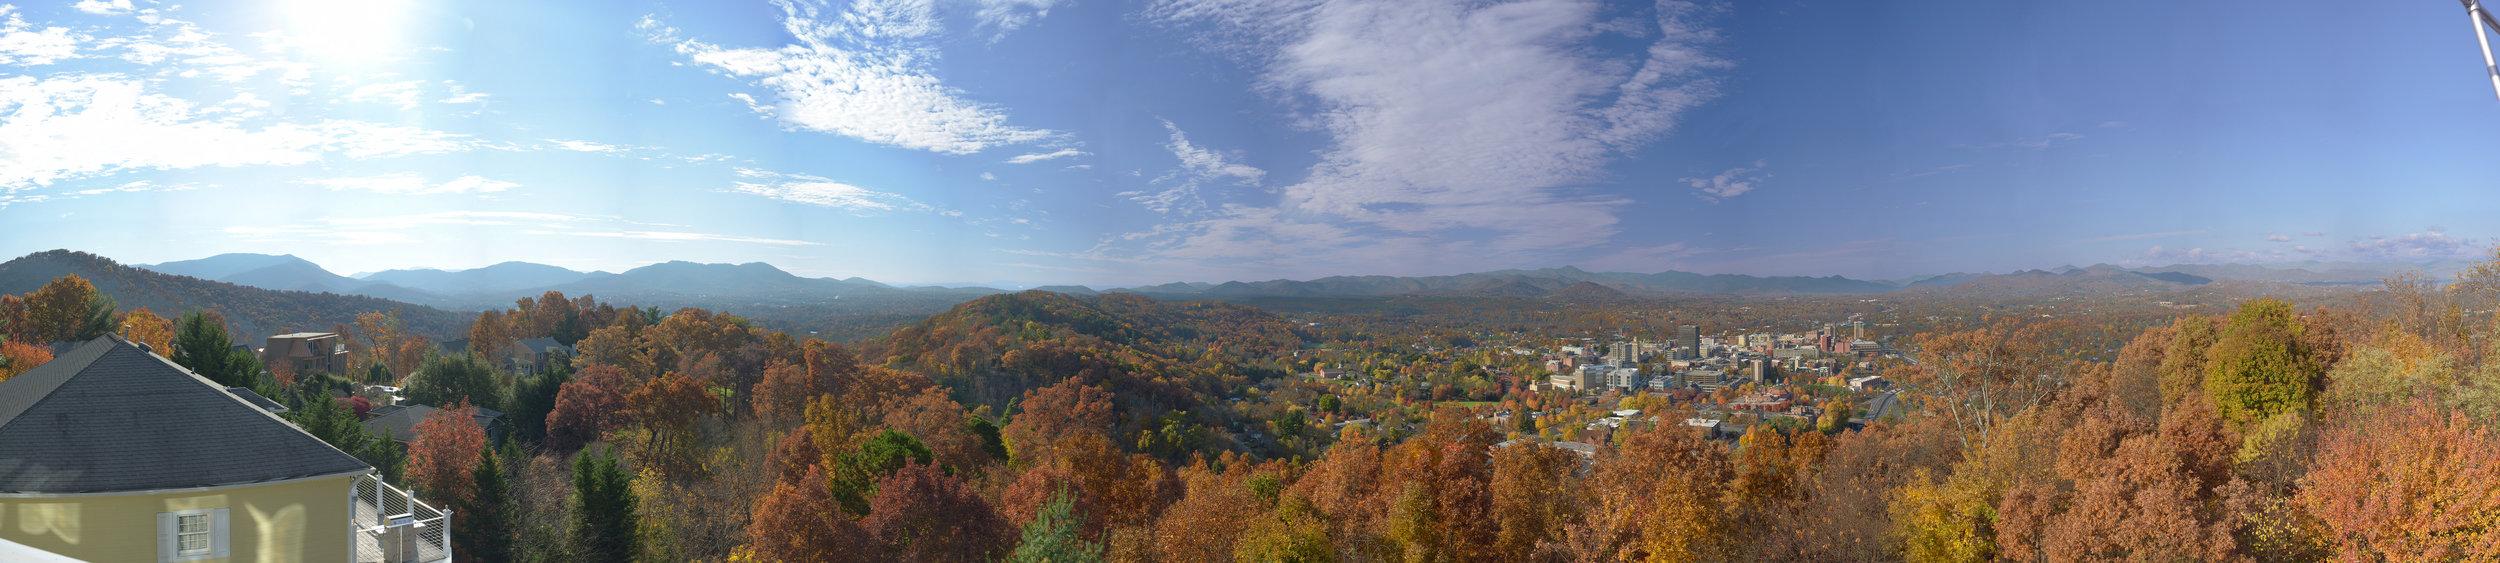 Asheville Fall